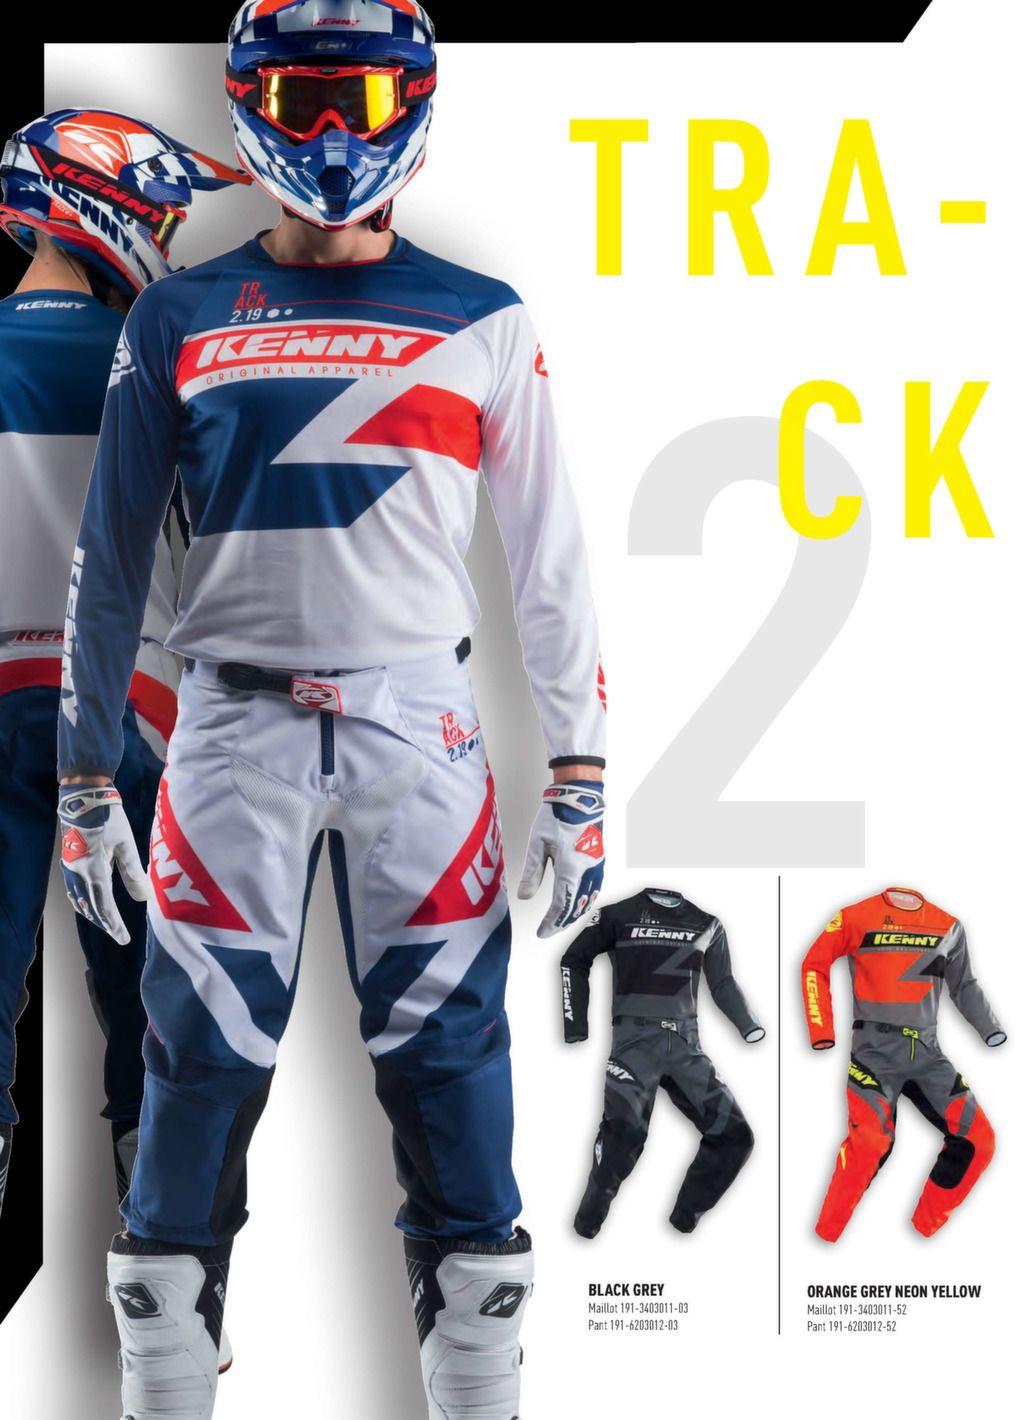 17f555106 MOTO 2019 - Kenny Racing